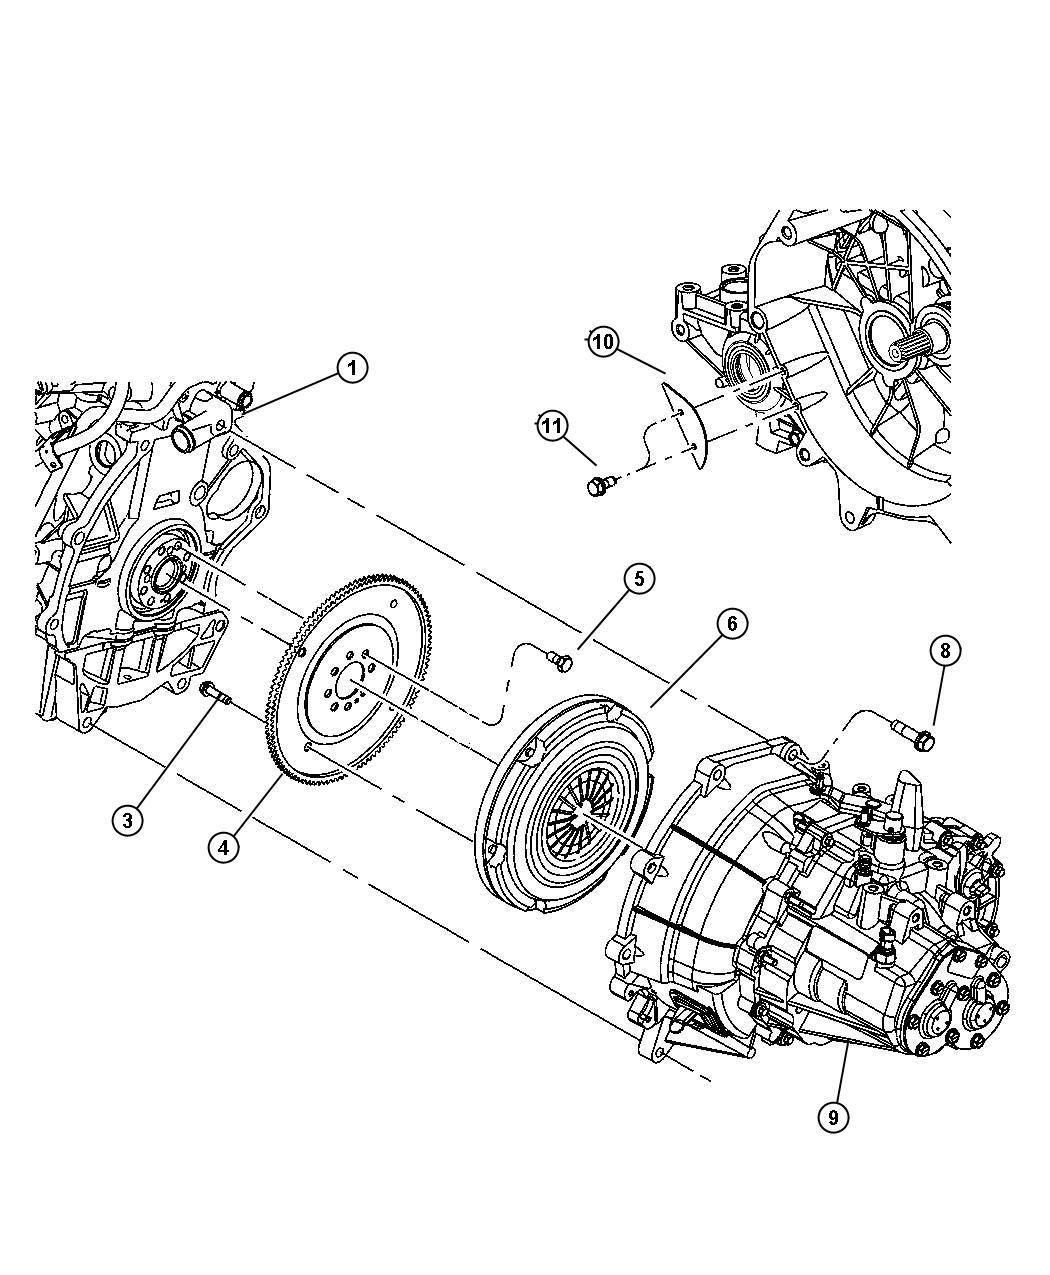 2001 Dodge Neon Plate kit. Clutch pressure. Disc